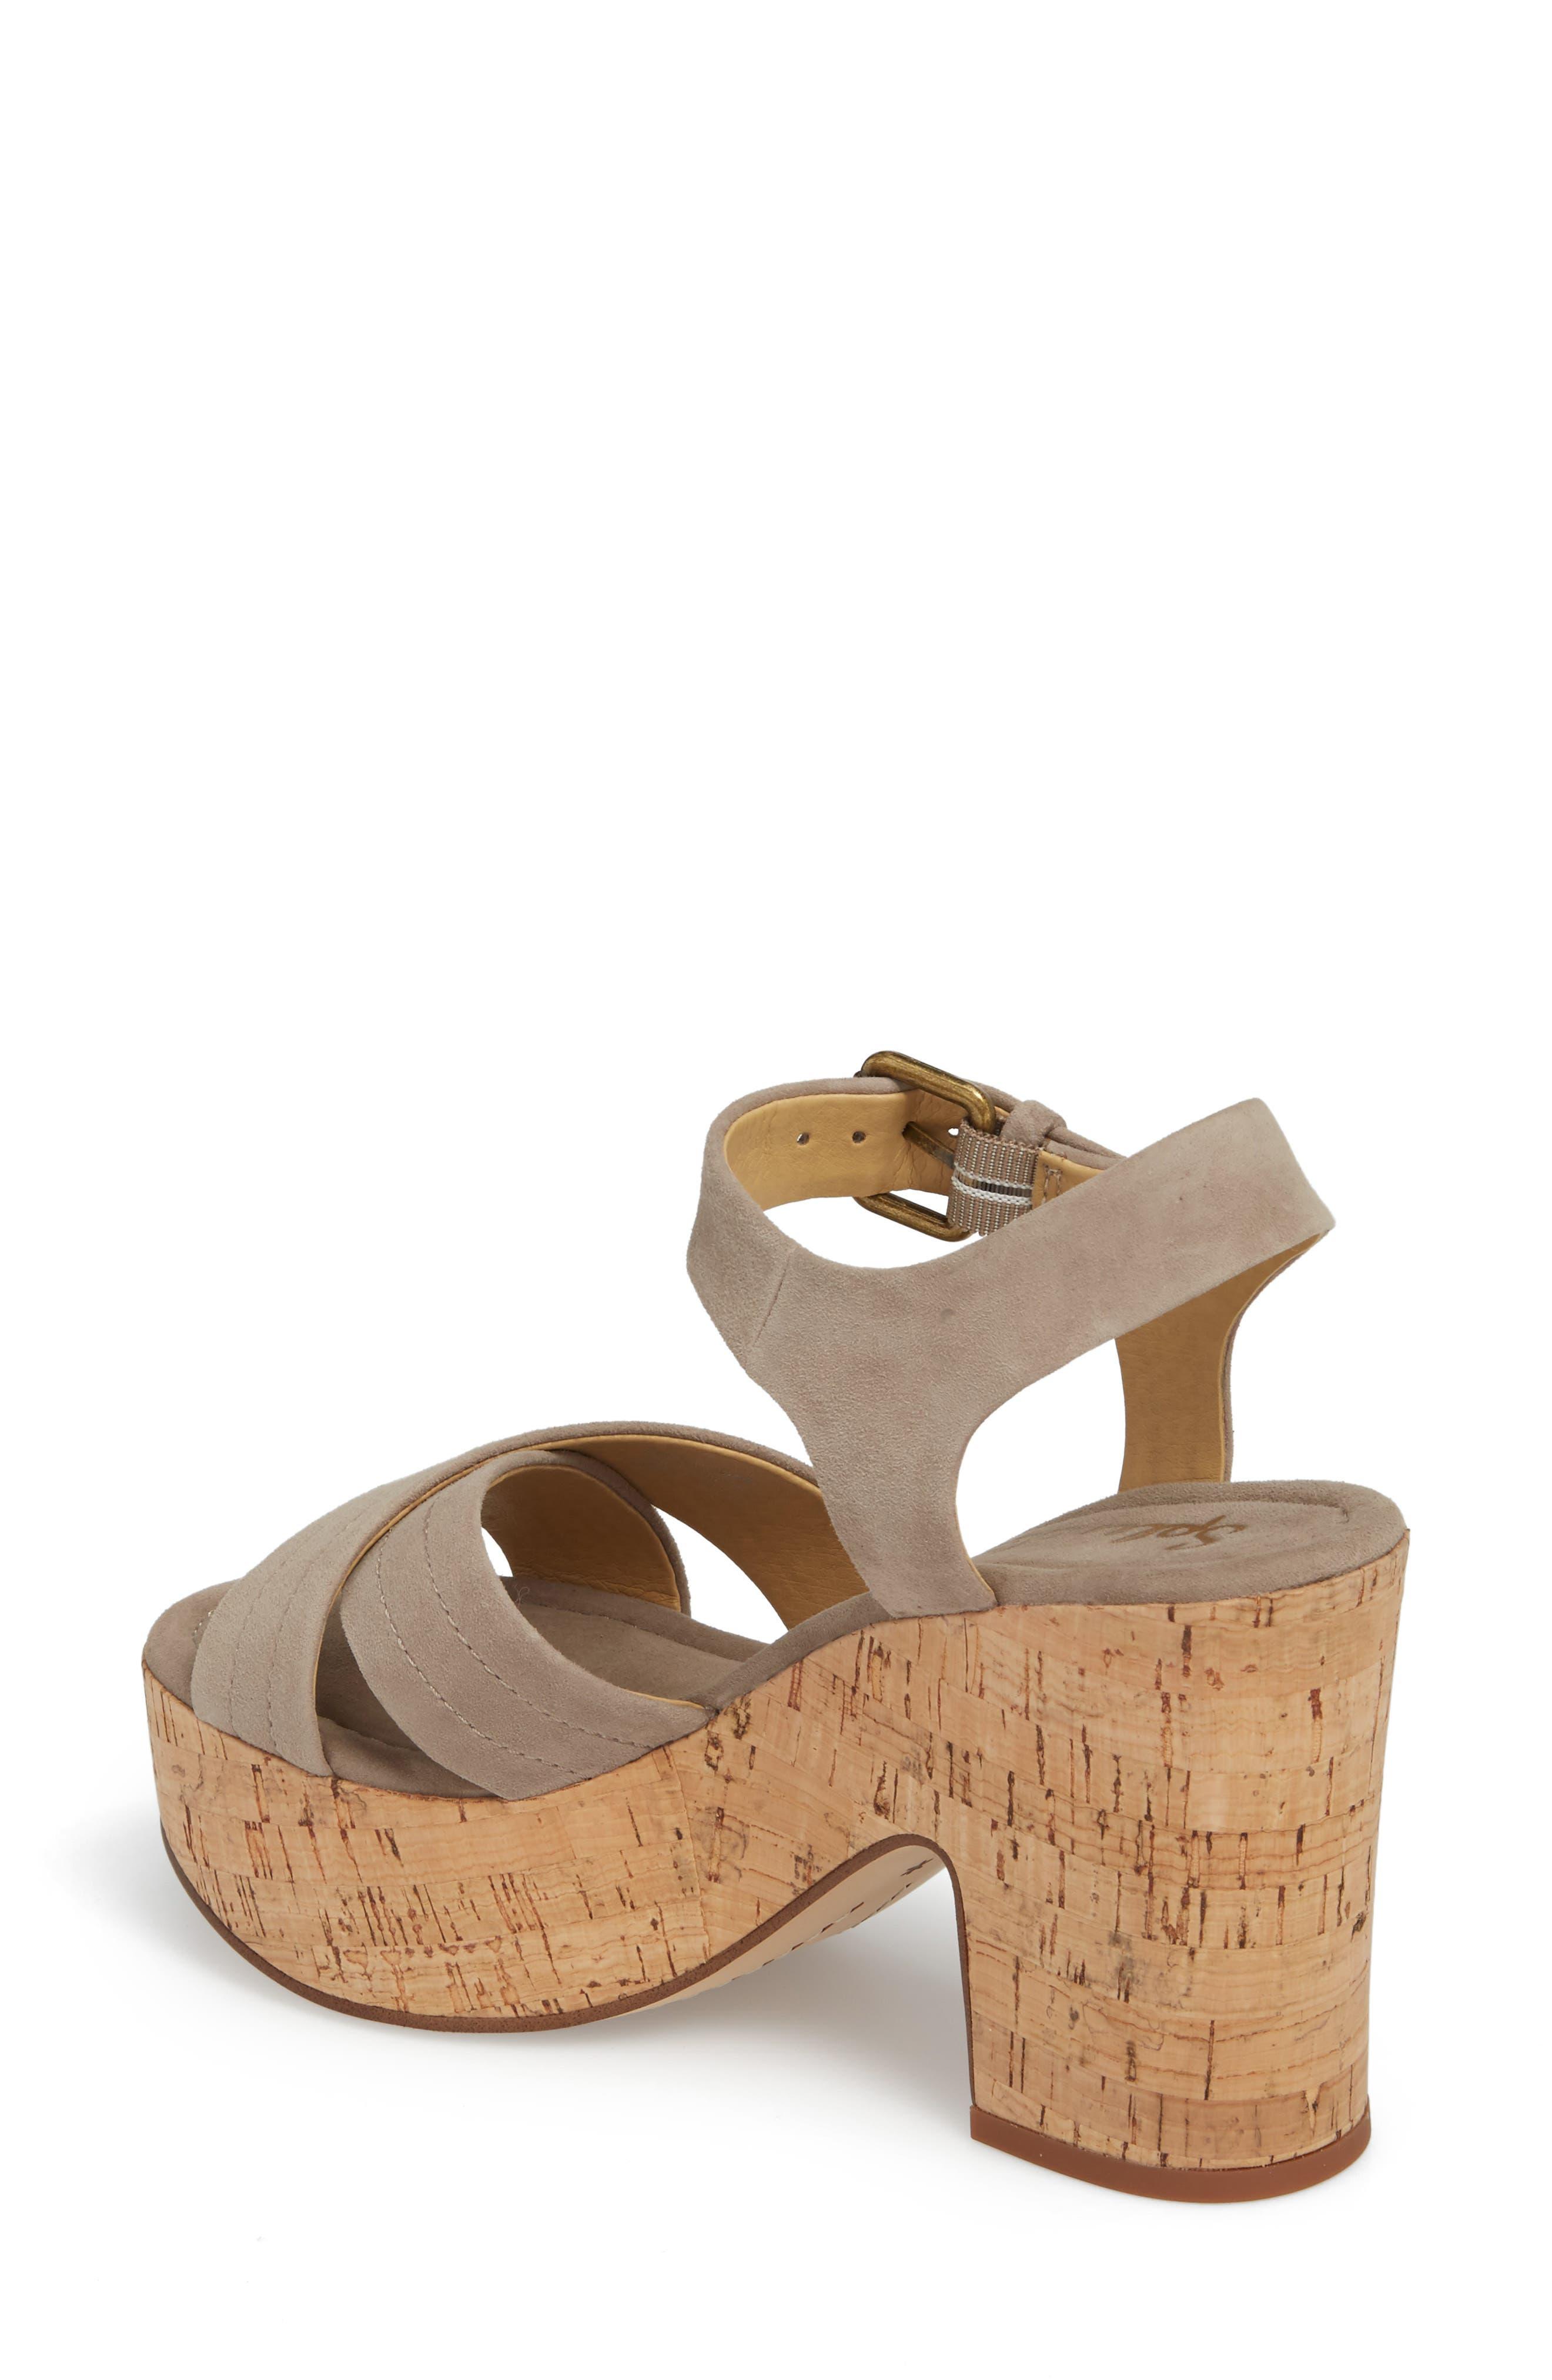 Flaire Platform Sandal,                             Alternate thumbnail 2, color,                             Taupe Suede